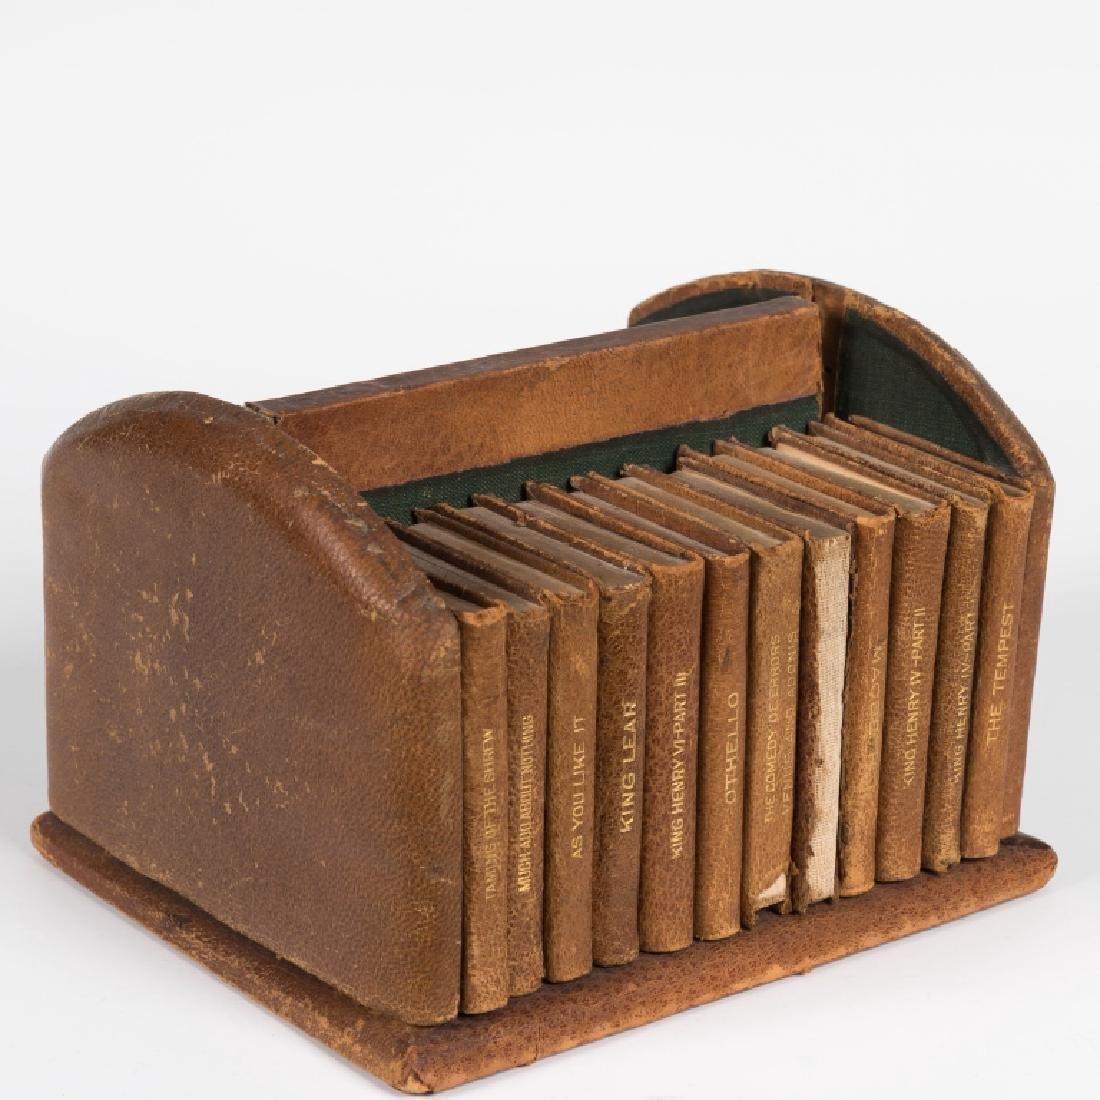 Shakespeare Miniature Set Leather Books - 24 Vol